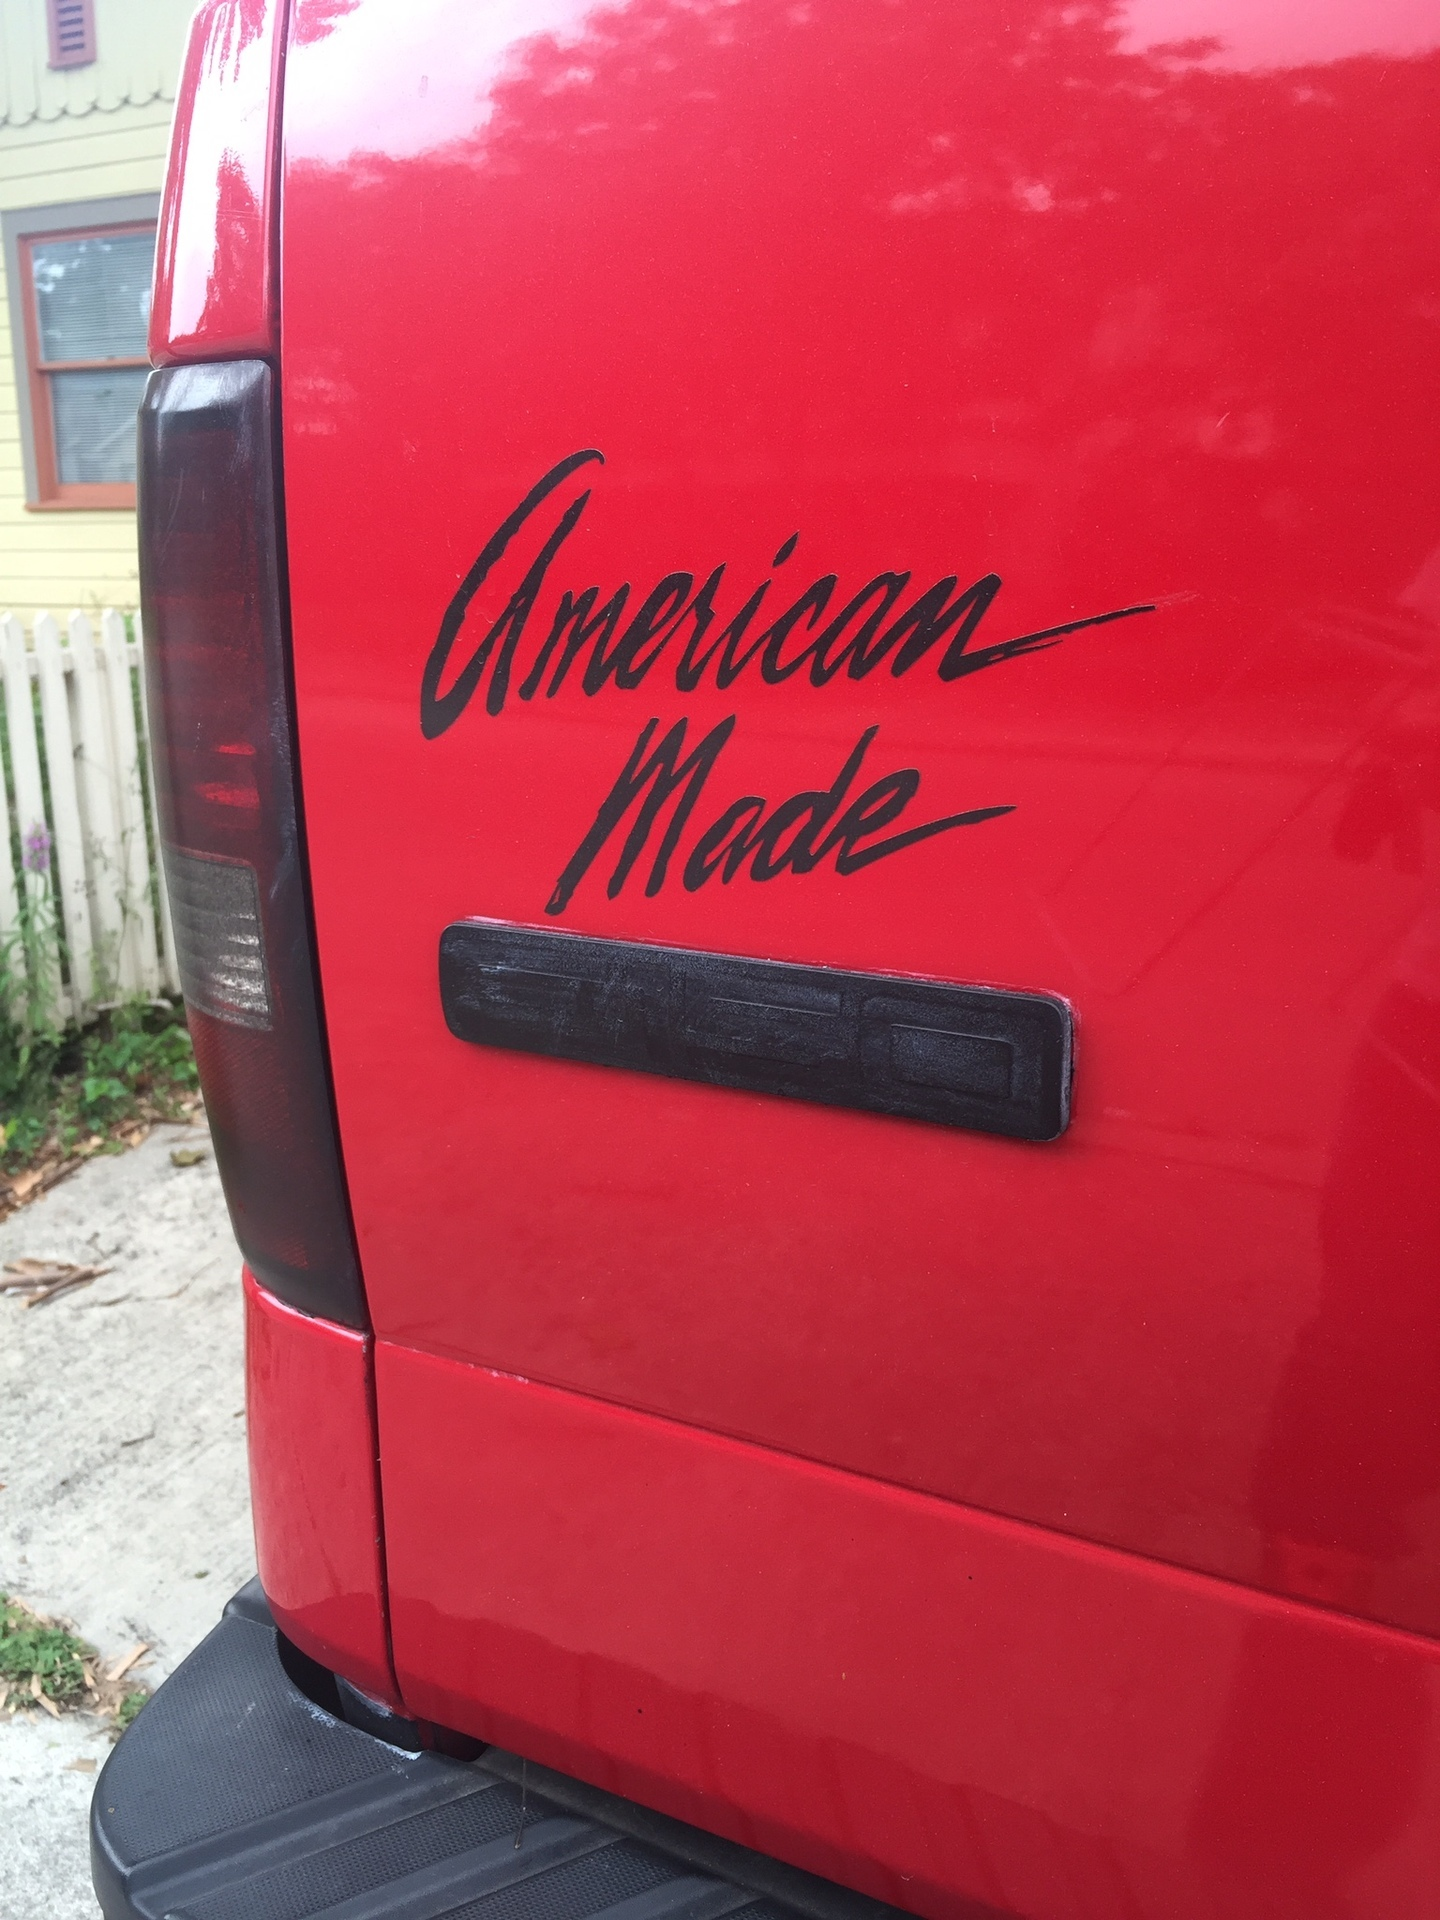 Brendan's photograph of their American Made Vinyl Lettering Sticker